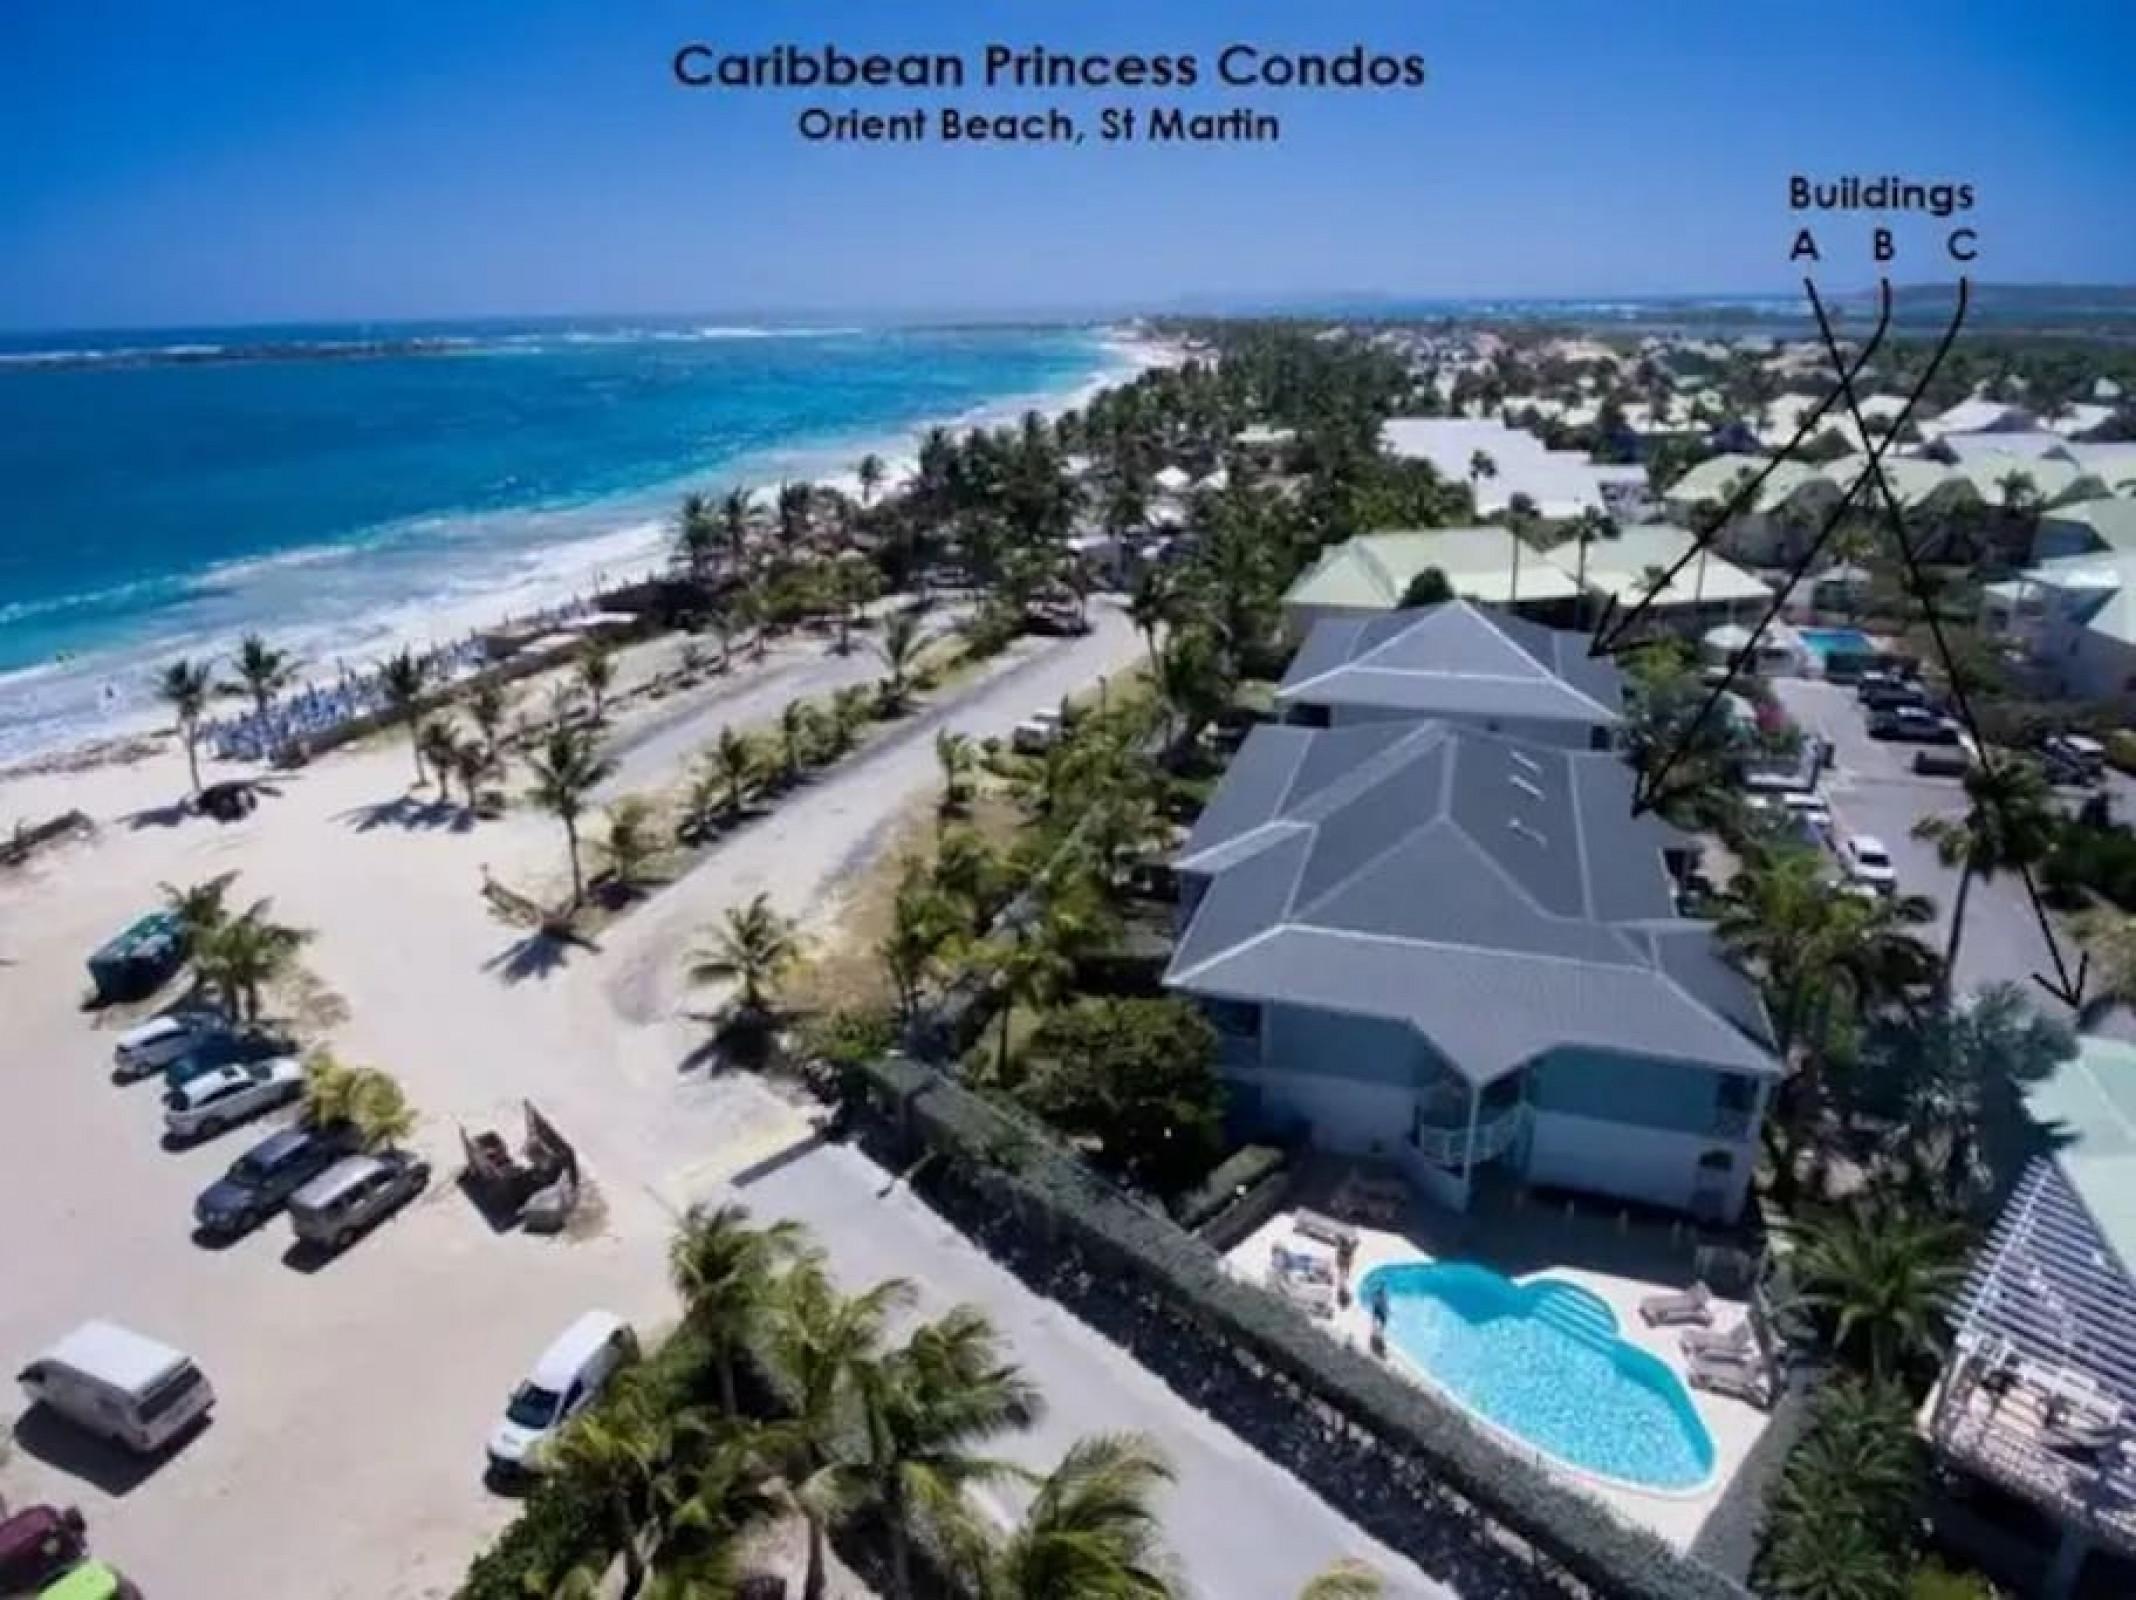 Princess Anaelle · Plage d'Orient Bay, piscine, terrasse, RDC, 150 m²